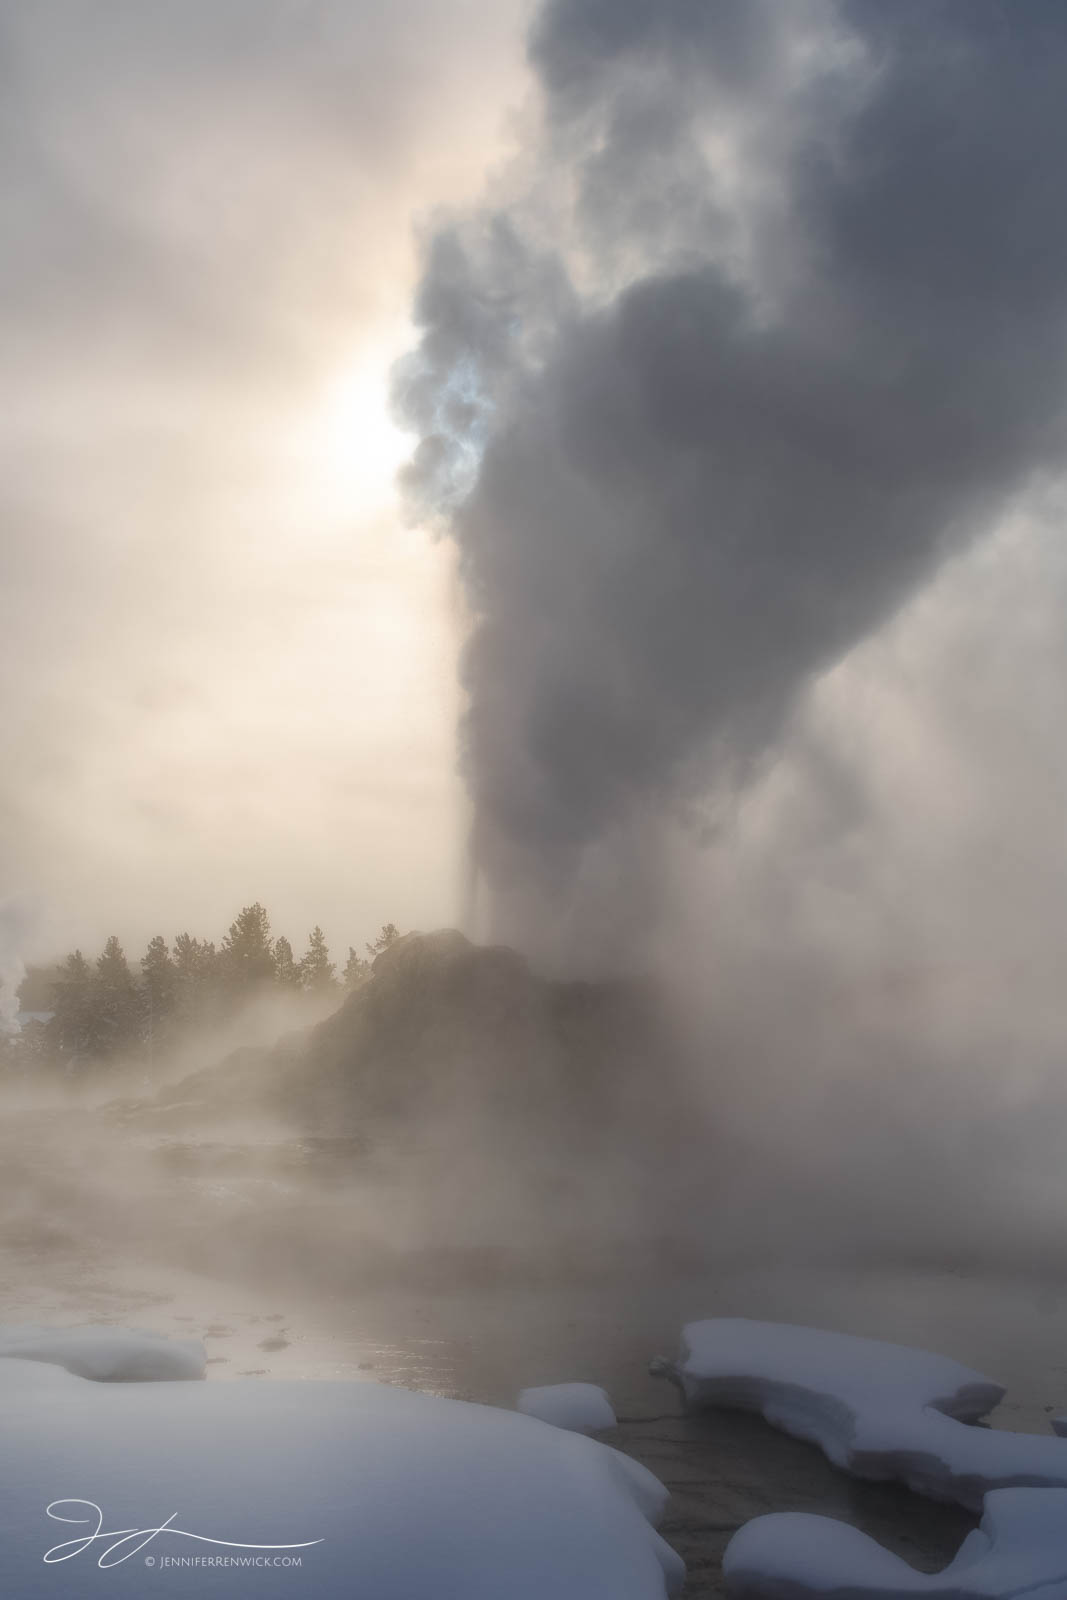 Upper Geyser Basin, Yellowstone national park, steam, sunrise, Wyoming, thermal feature, castle geyser, winter, snow, erupting, landscape, photo